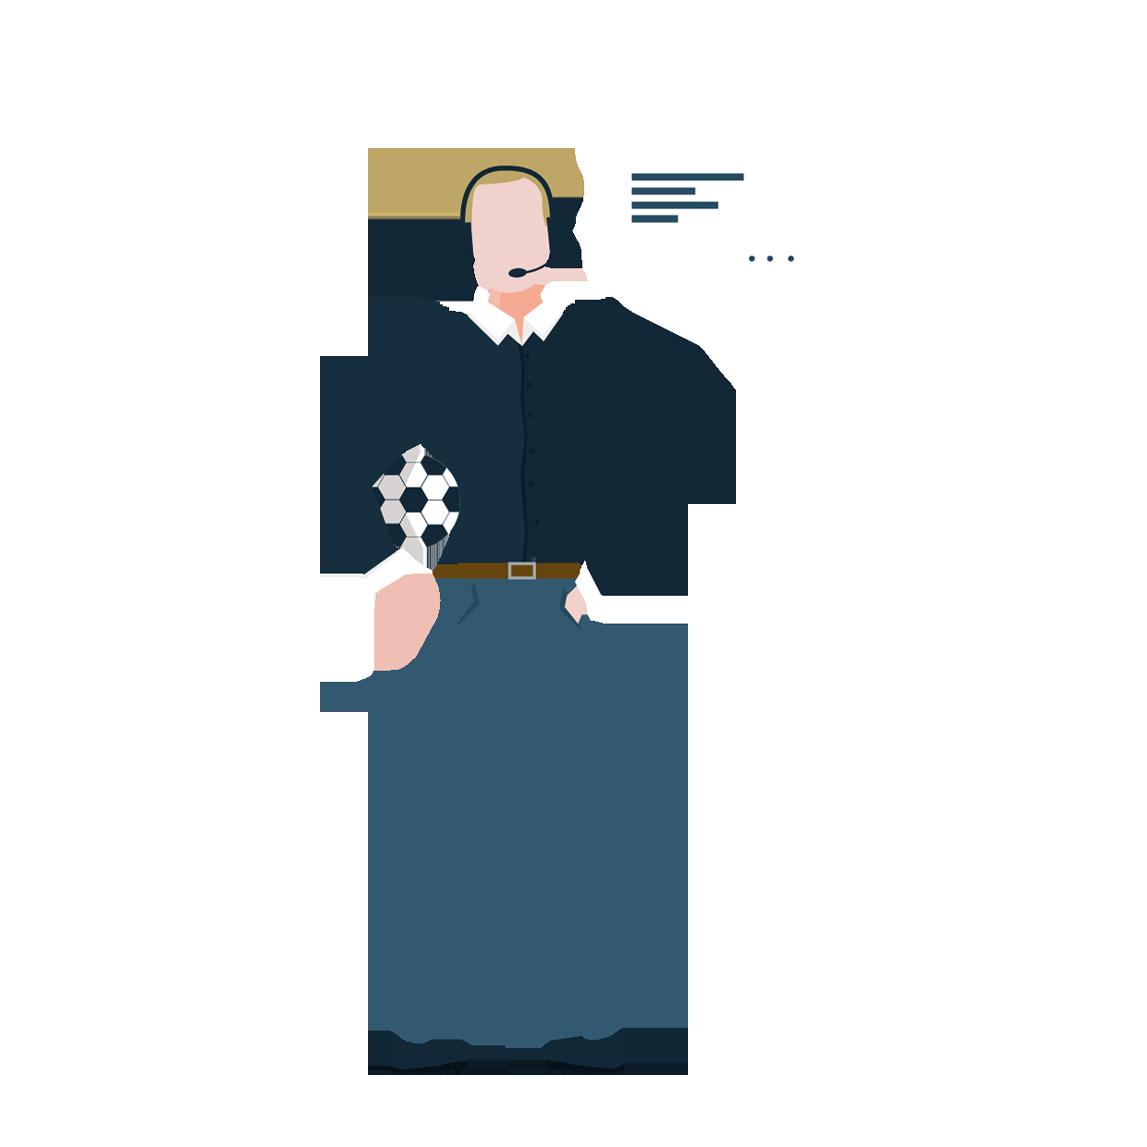 Mark-made-marketing-avatar